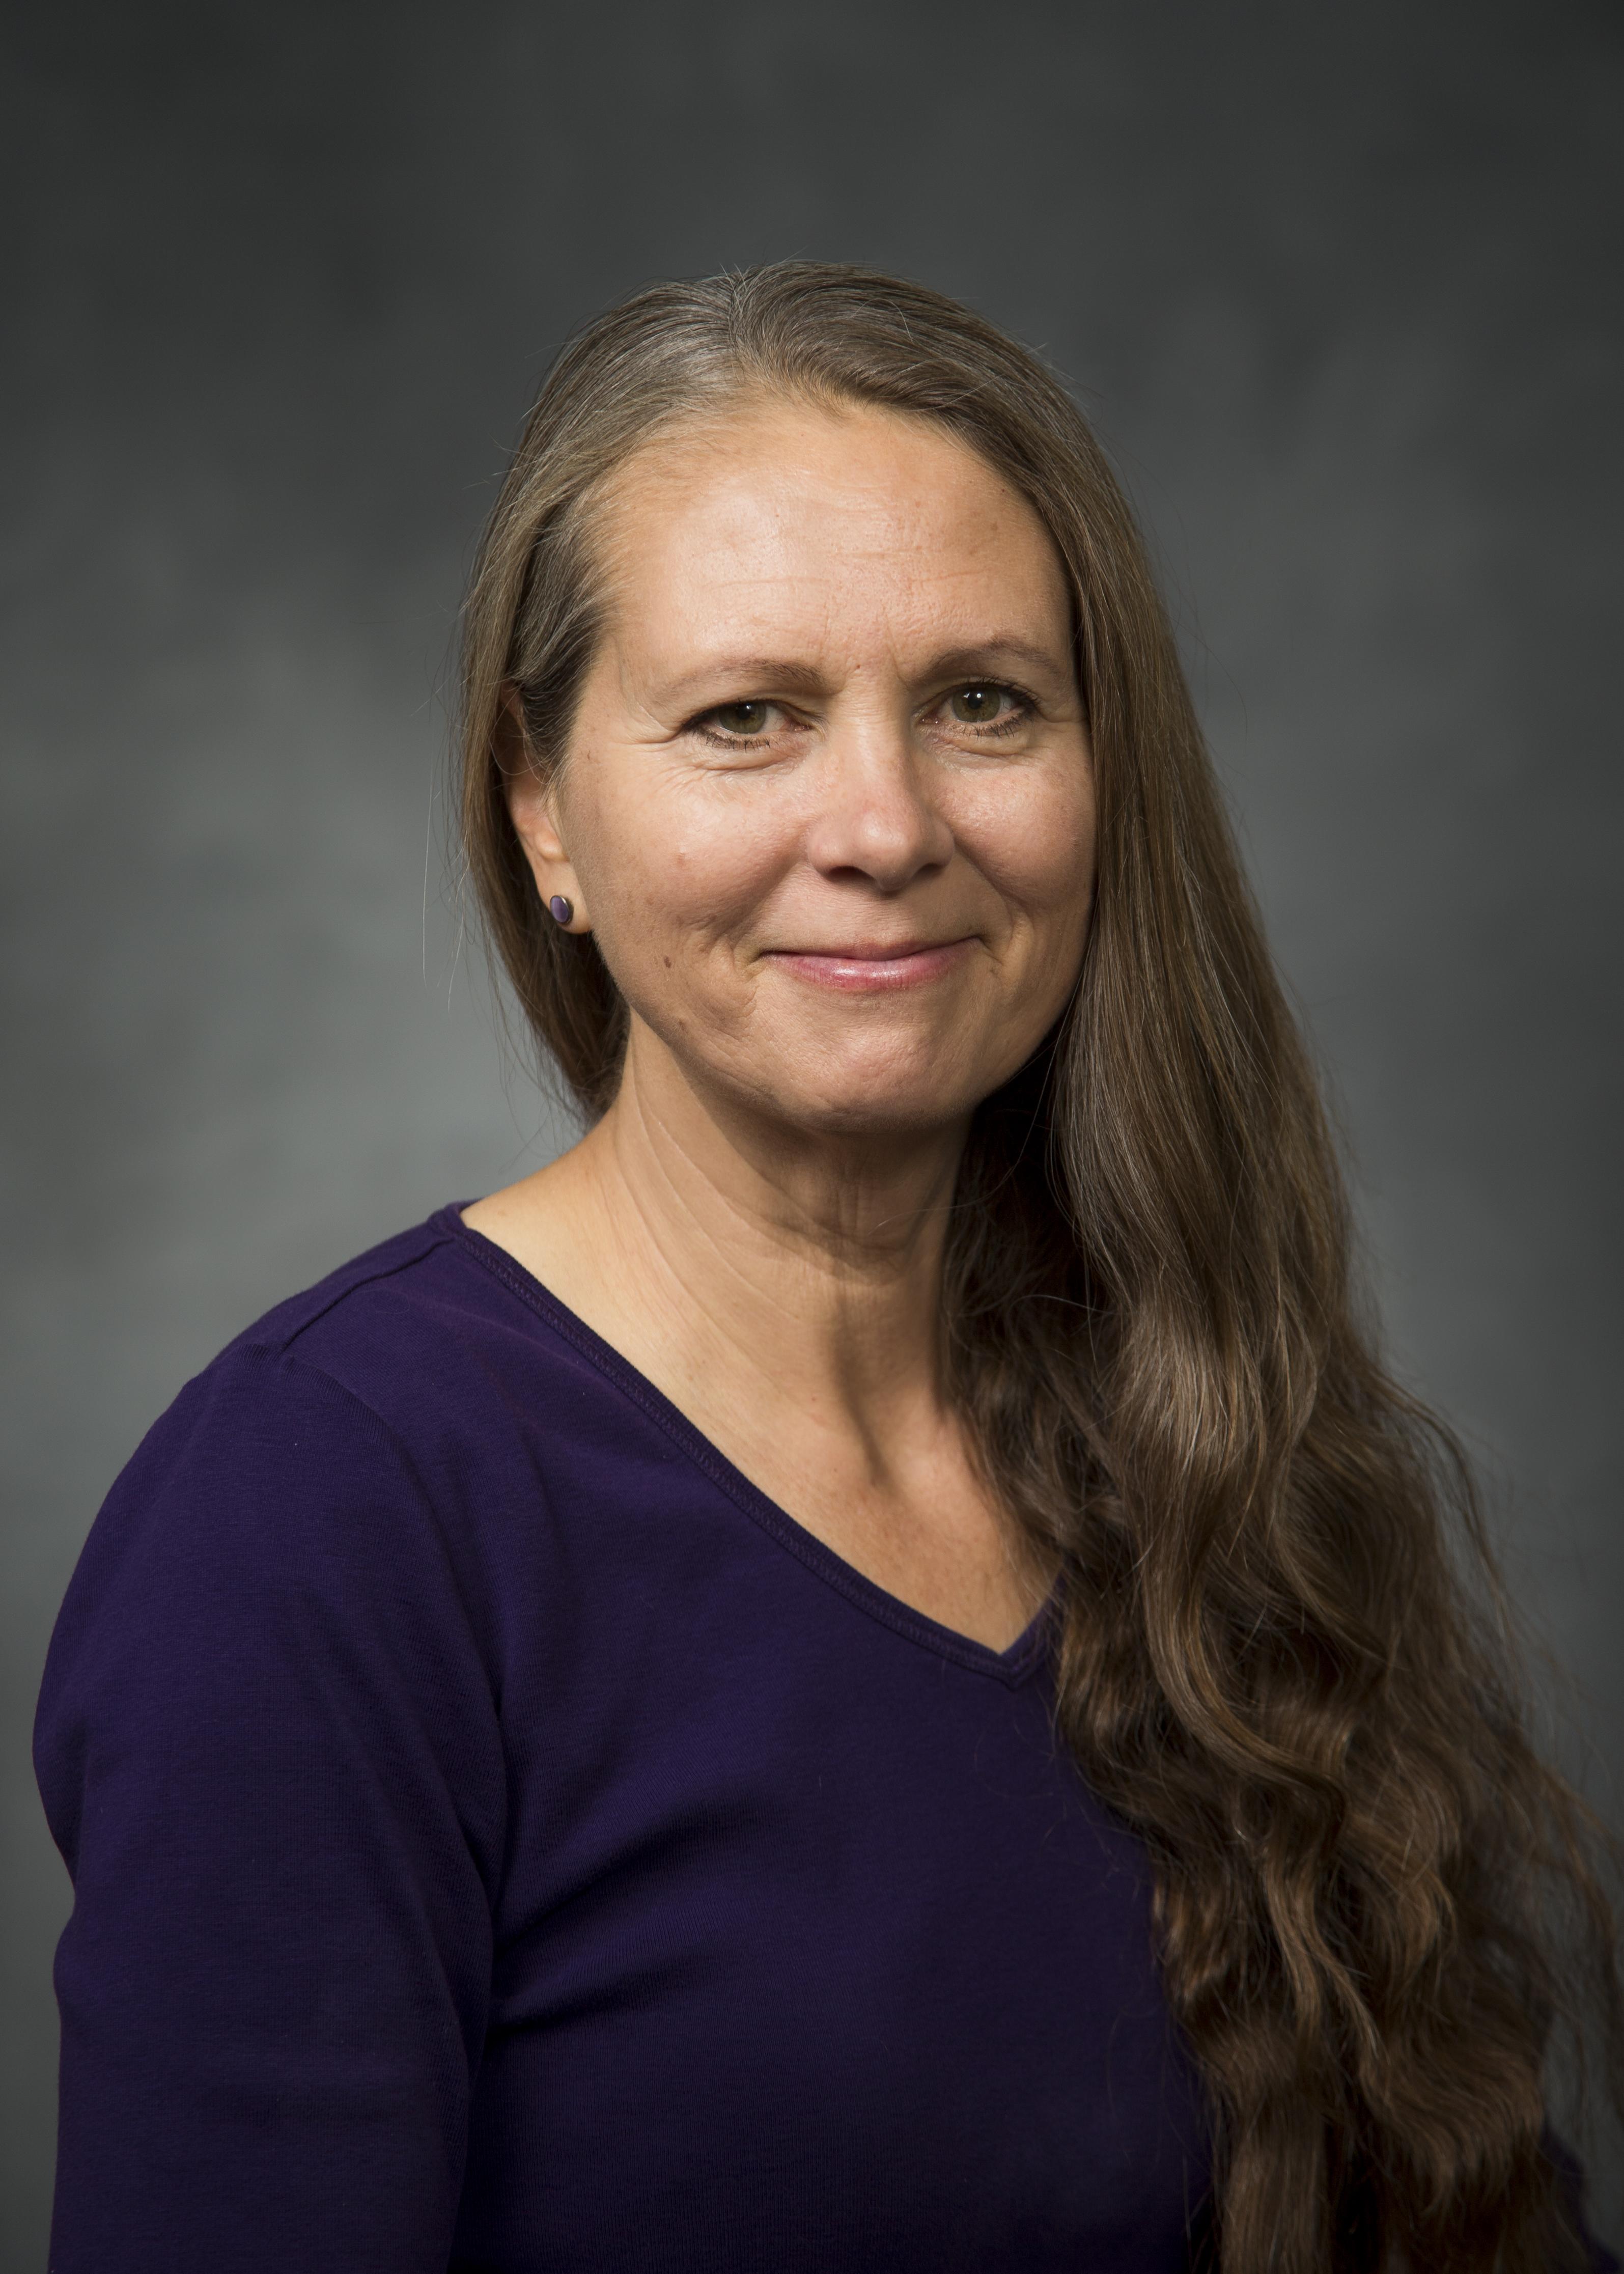 Bonnie S. Bingham